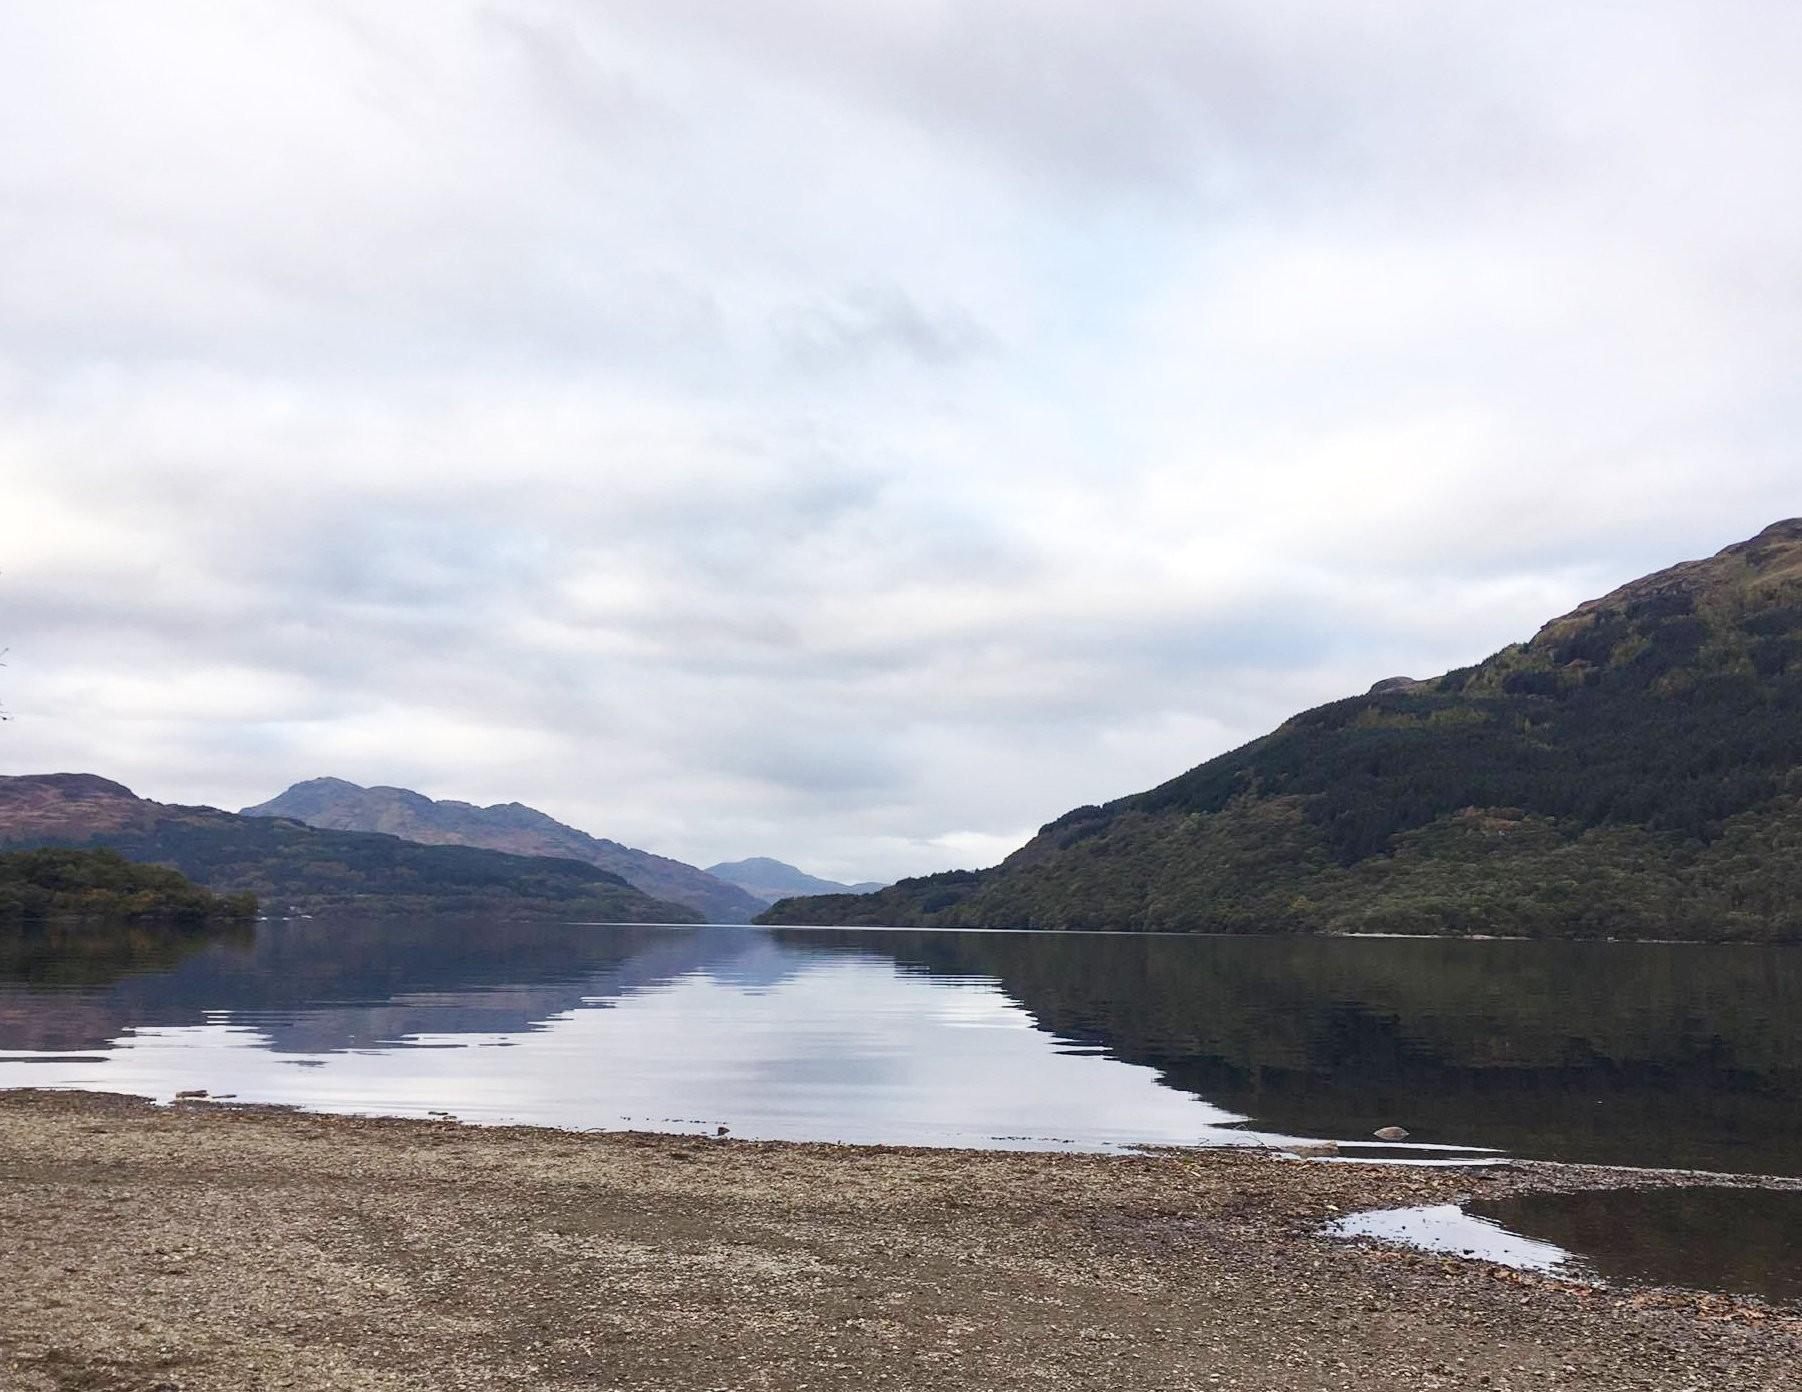 Loch Lomond by Christopher McAuley-Paton